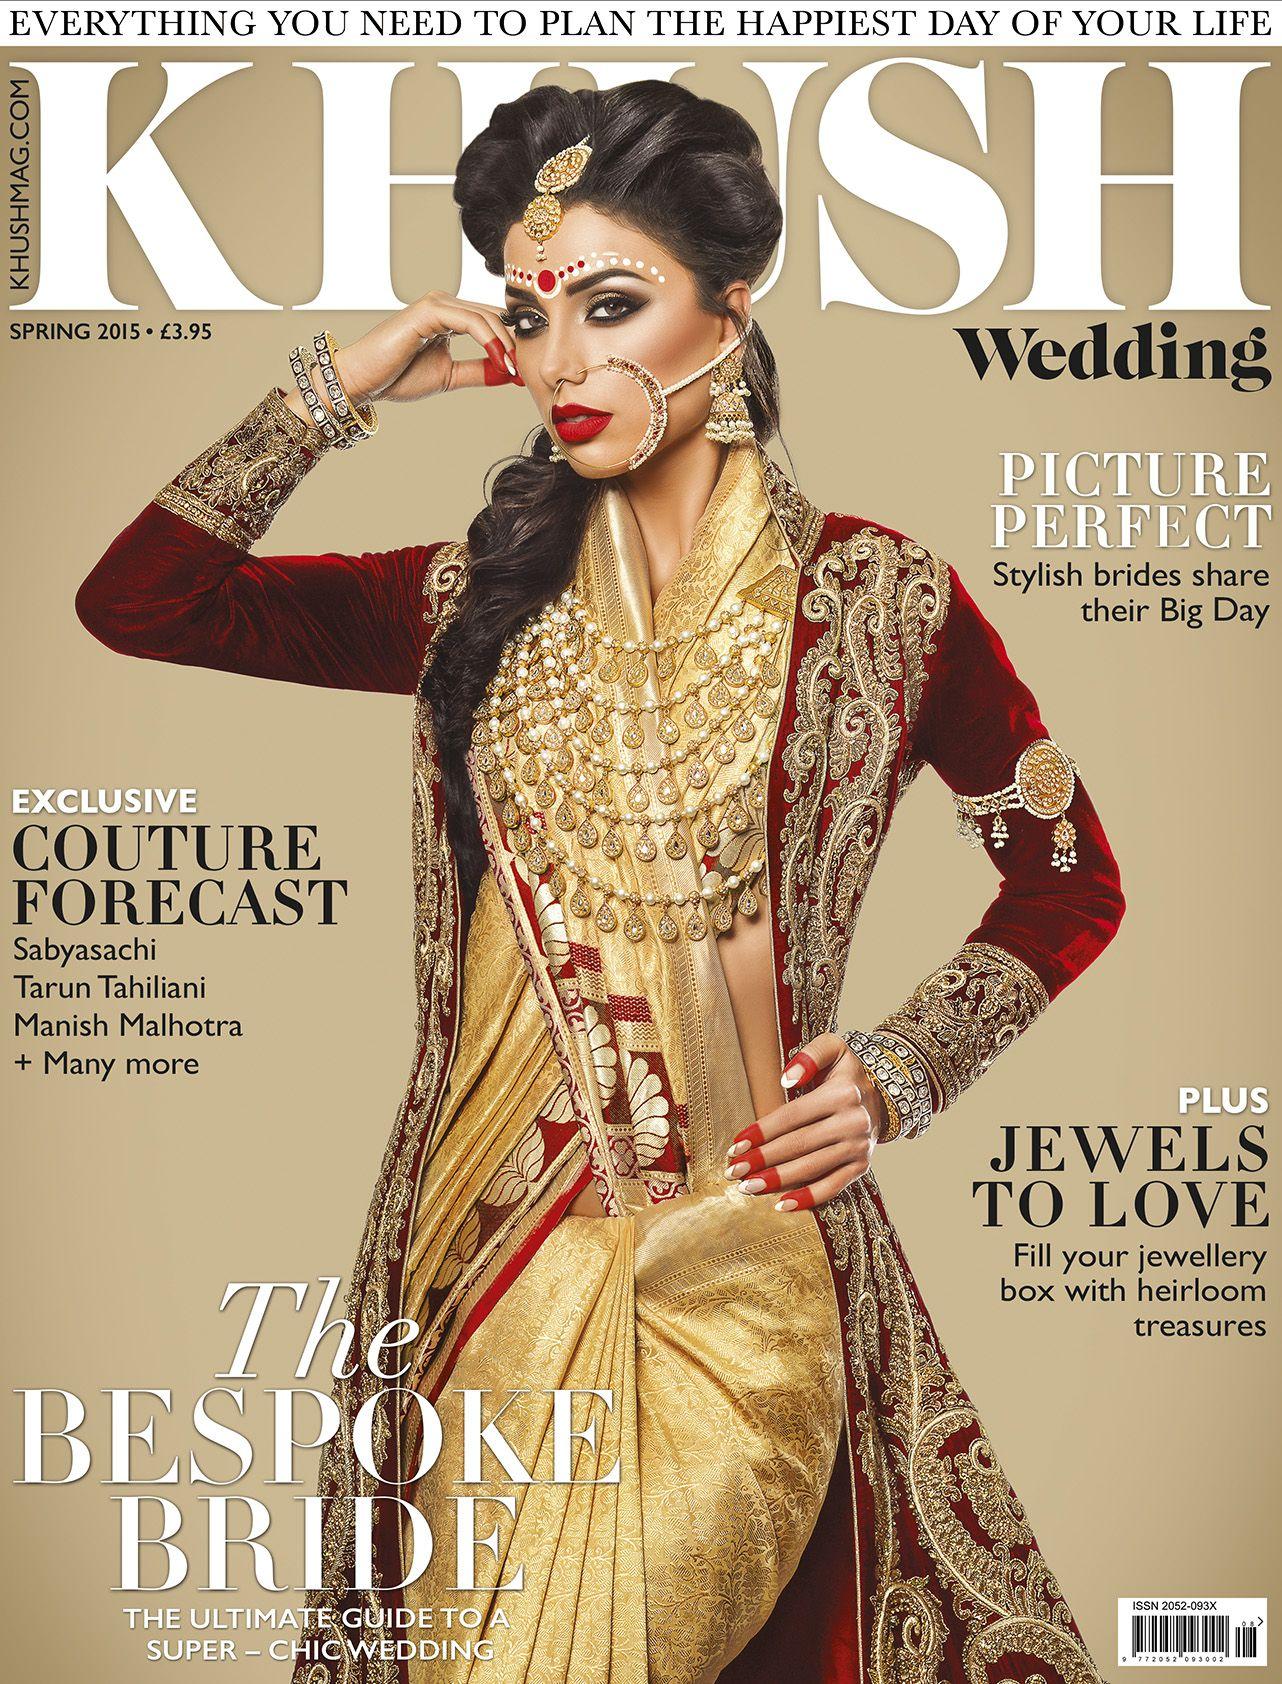 wedding magazines CELEBRATING INDIAN BRIDAL FASHION Say hello to the bespoke bride of the year She